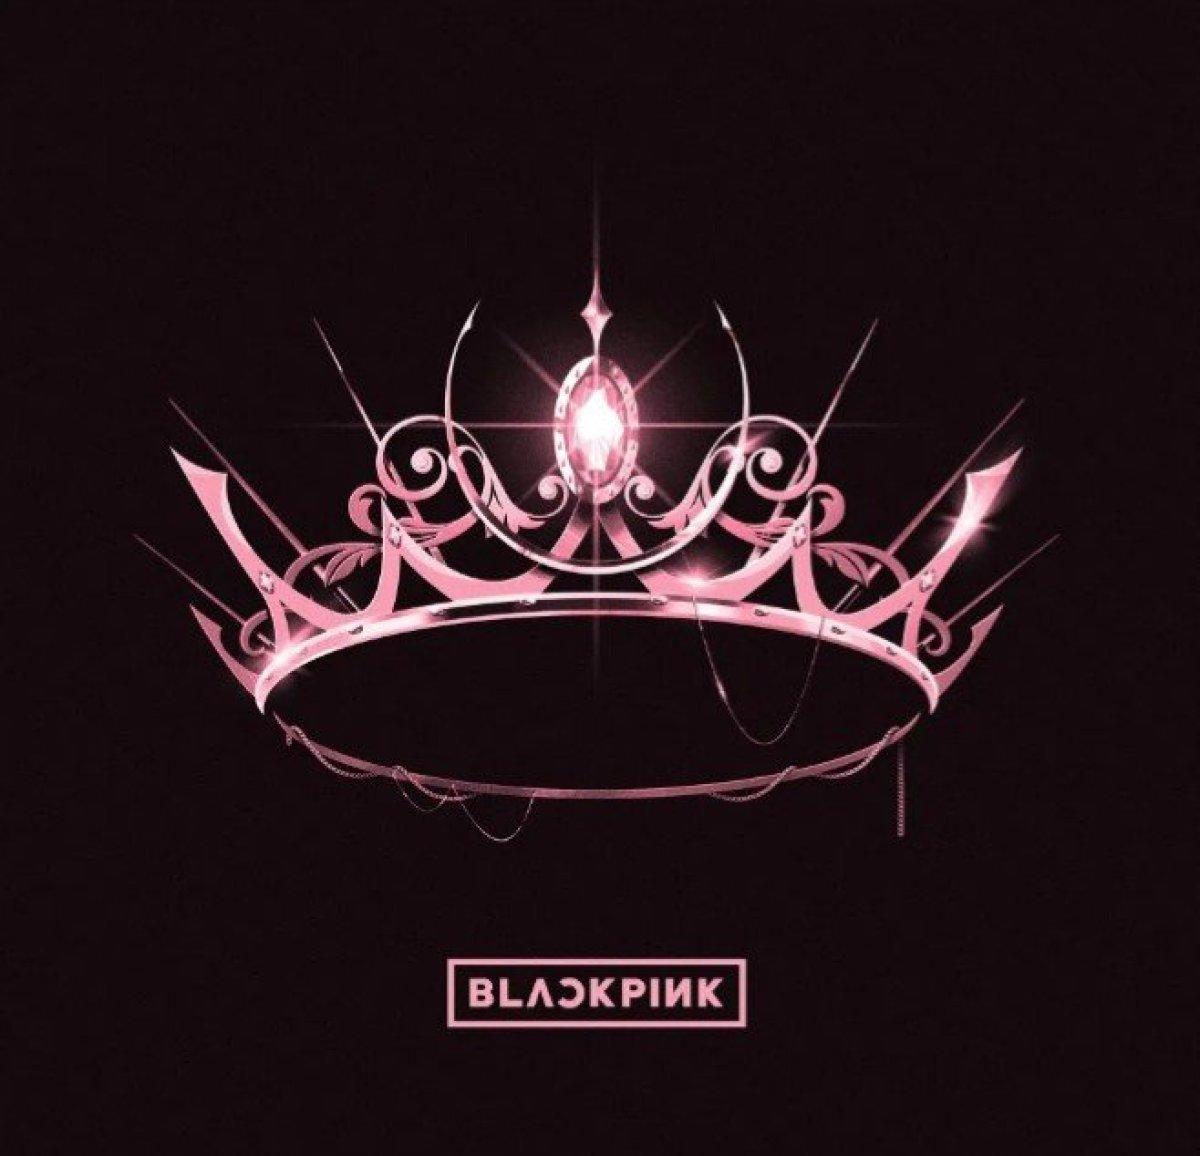 BLACKPINK Ft. Cardi B – Bet You Wanna MP3 DOWNLOAD FREE